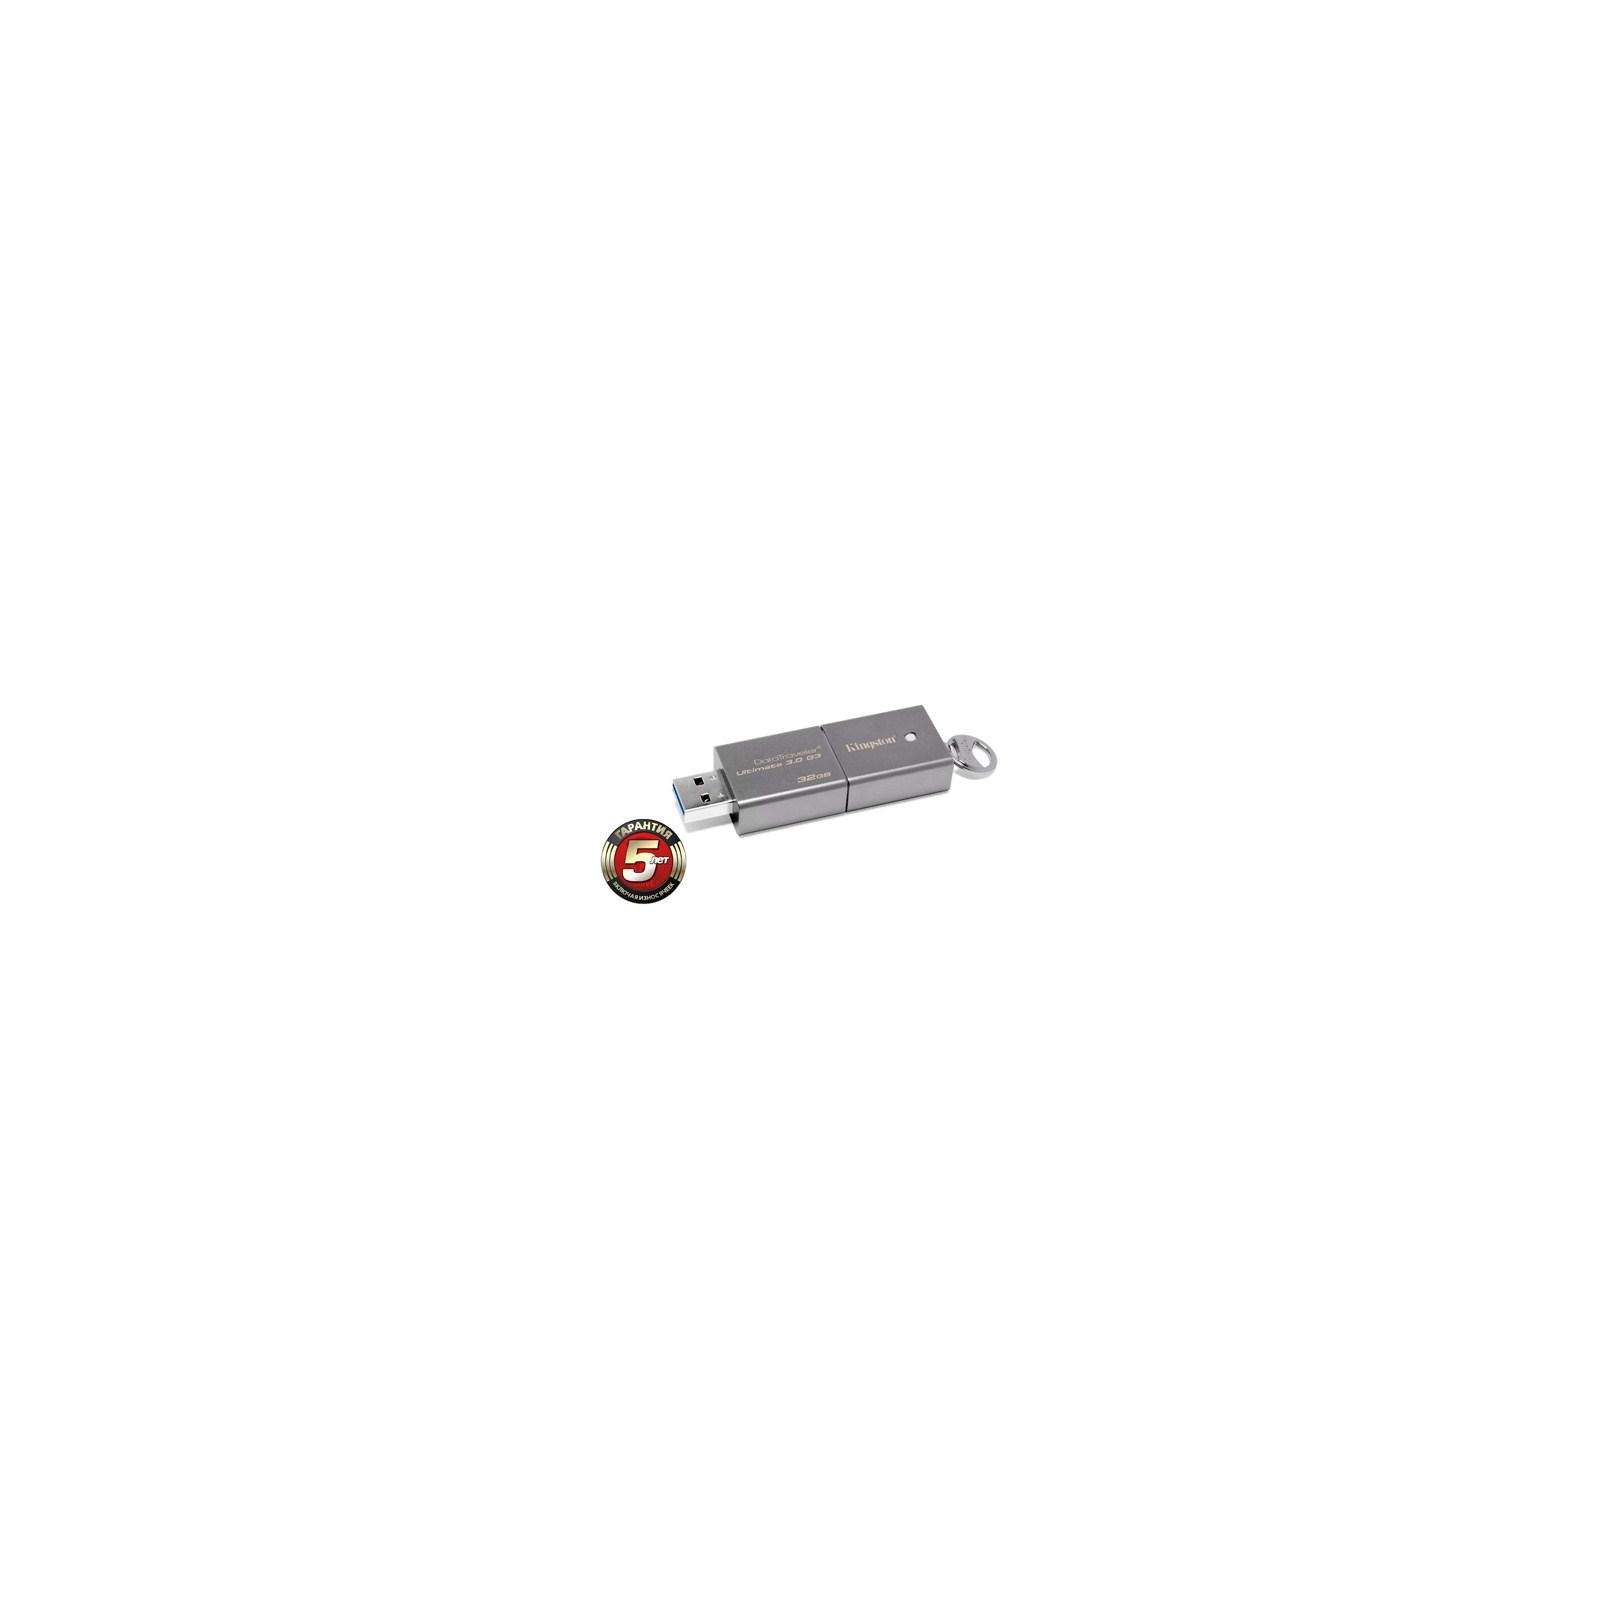 USB флеш накопитель Kingston 32Gb DataTraveler Ultimate G3 USB3.0 (DTU30G3/32GB) изображение 2